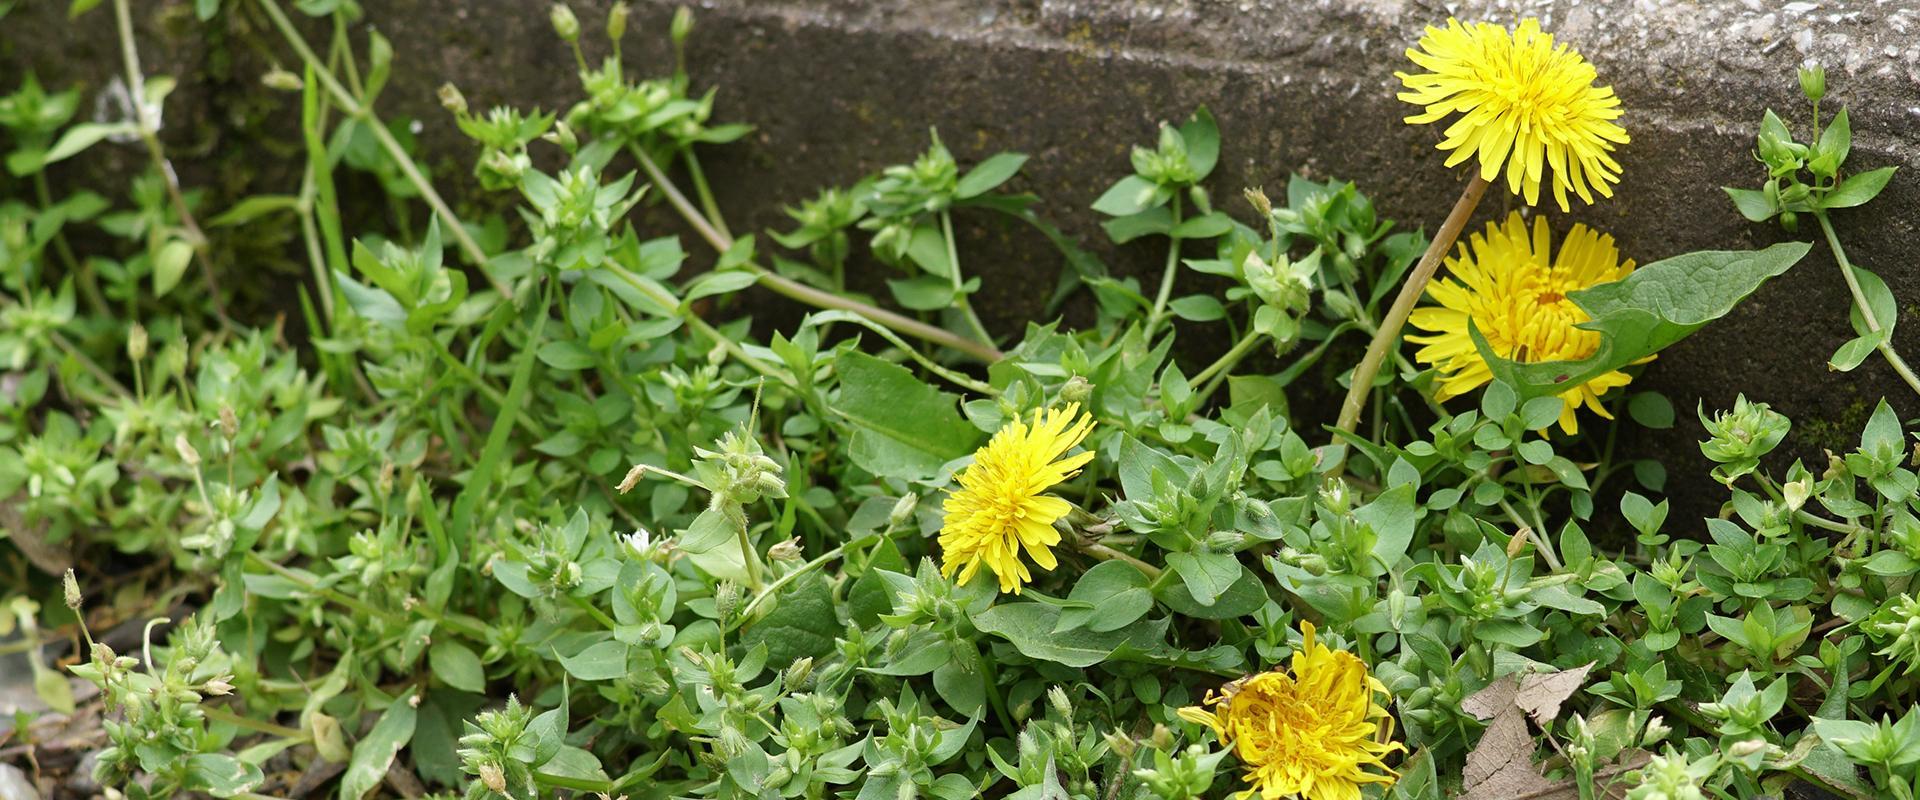 weeds on sidewalk